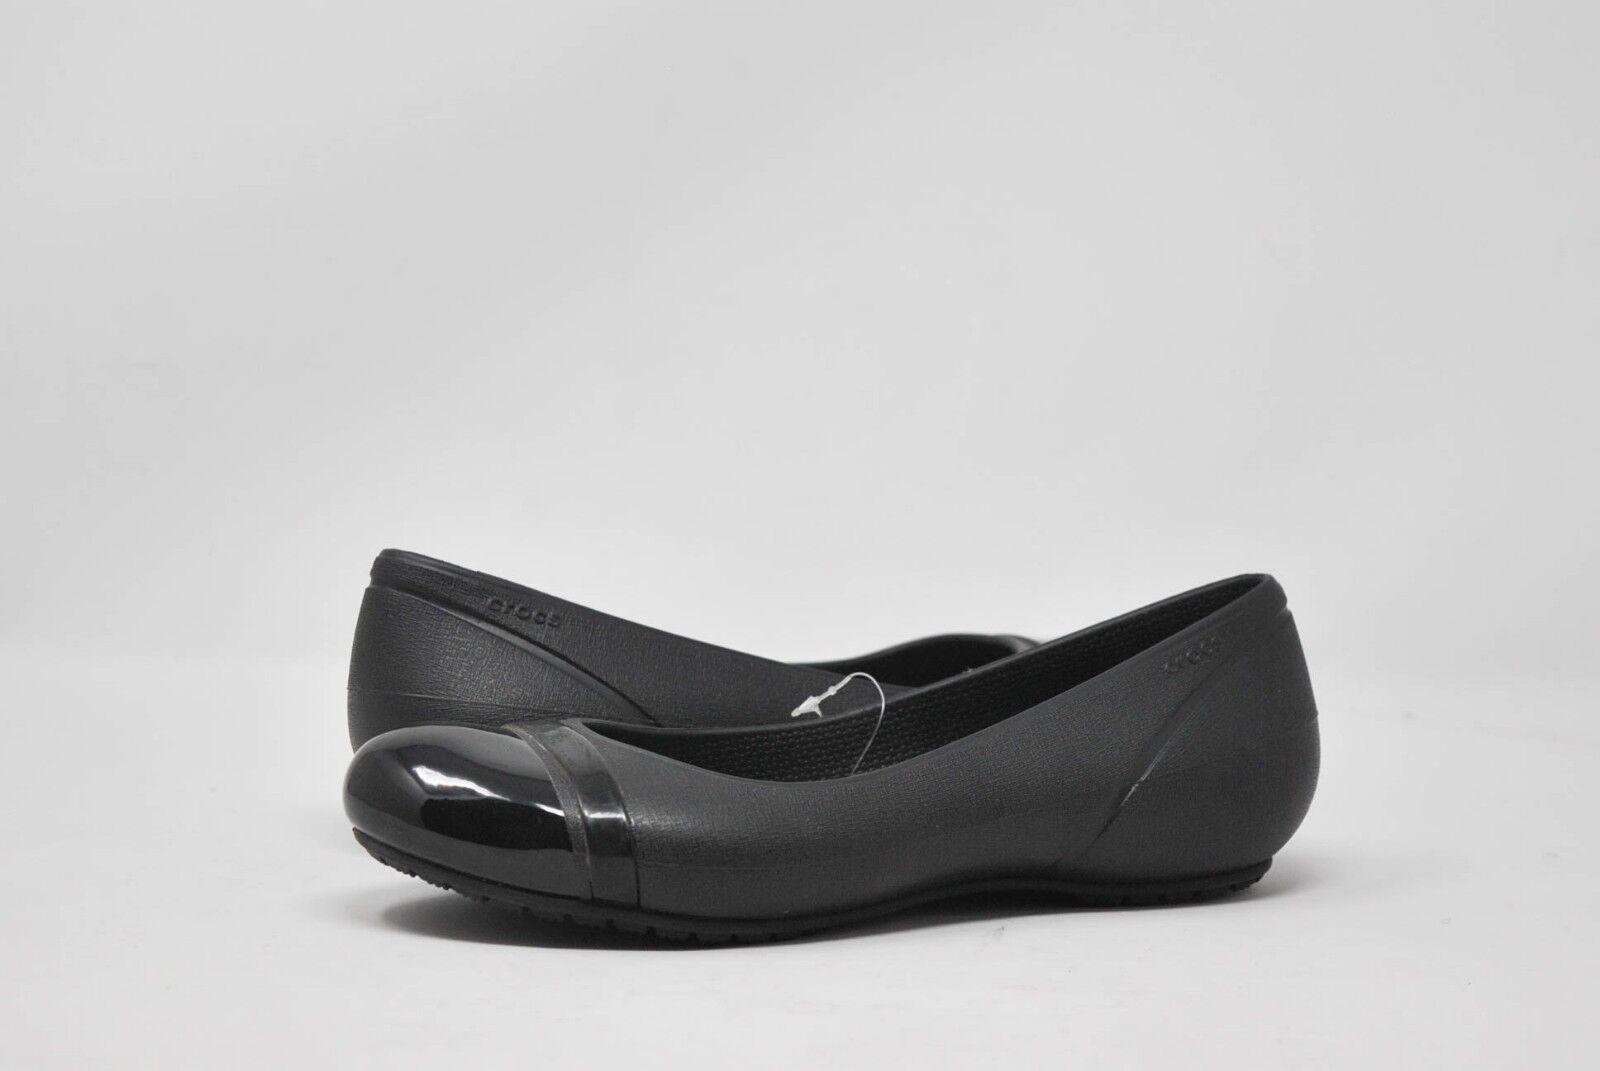 Croc's Women's Cap Toe Flat 12300-060-420 in Black NEW